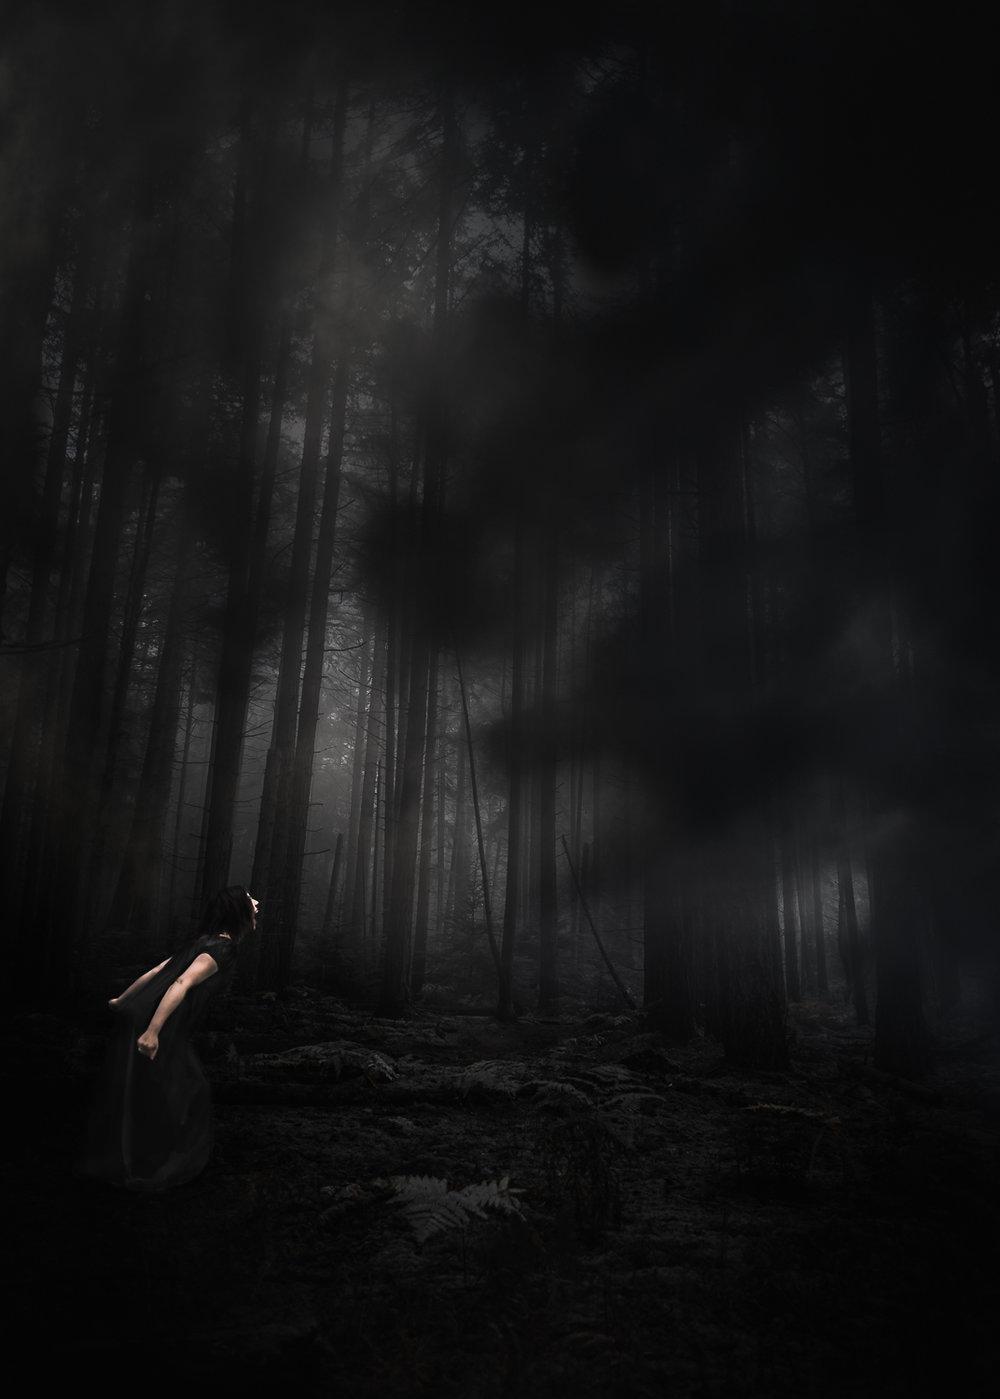 sarahbsmithart-dreams-ghosts--6.jpg